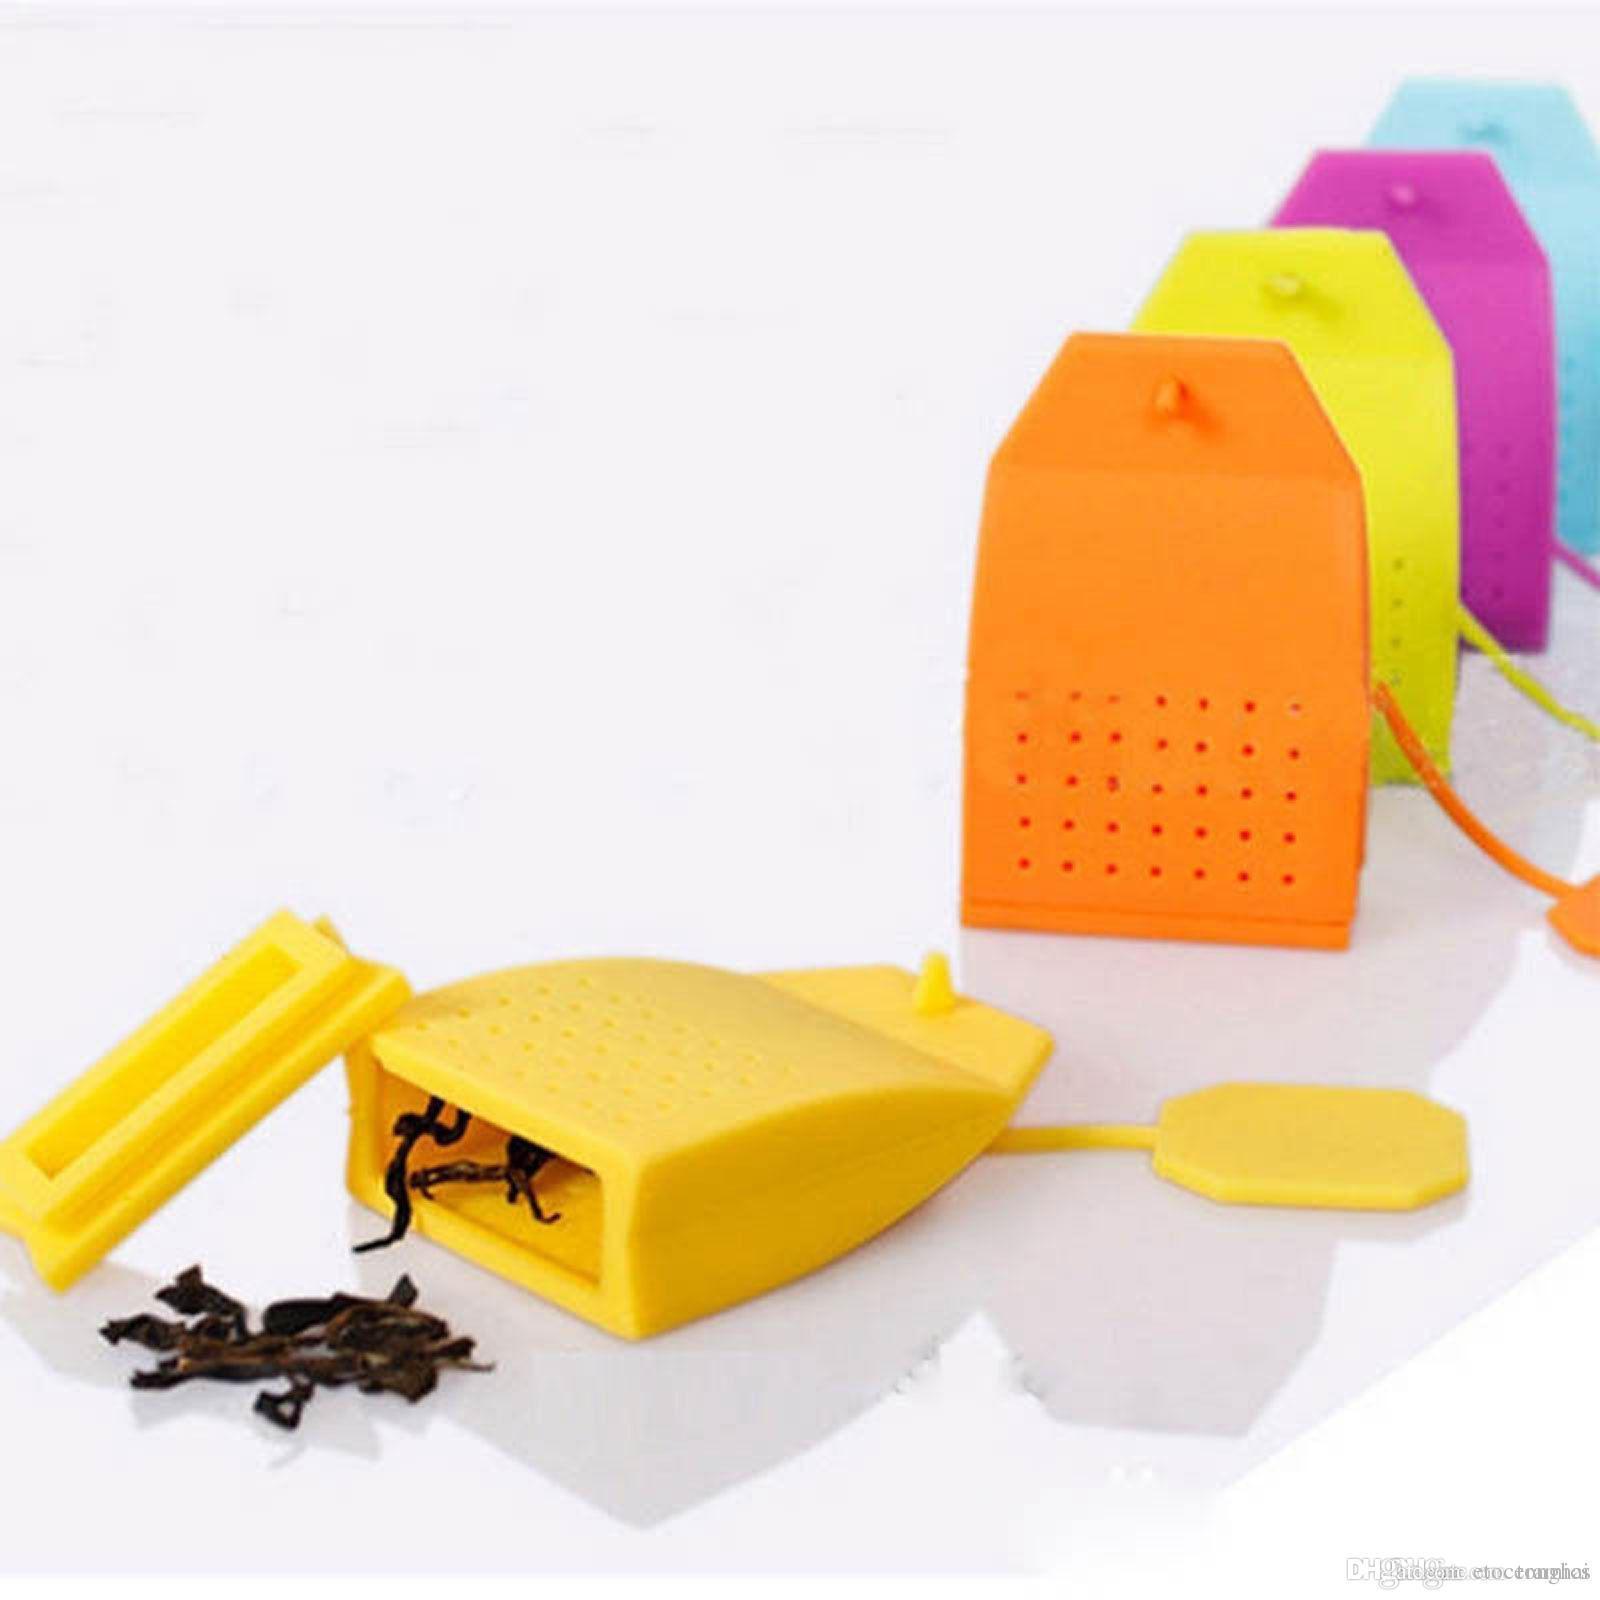 Chá-coador de chá ferramentas de arte Saco de Forma De Silicone Solto Folha De Chá Filtro Coador de Ervas Especiarias Infusor Difusor EEA256